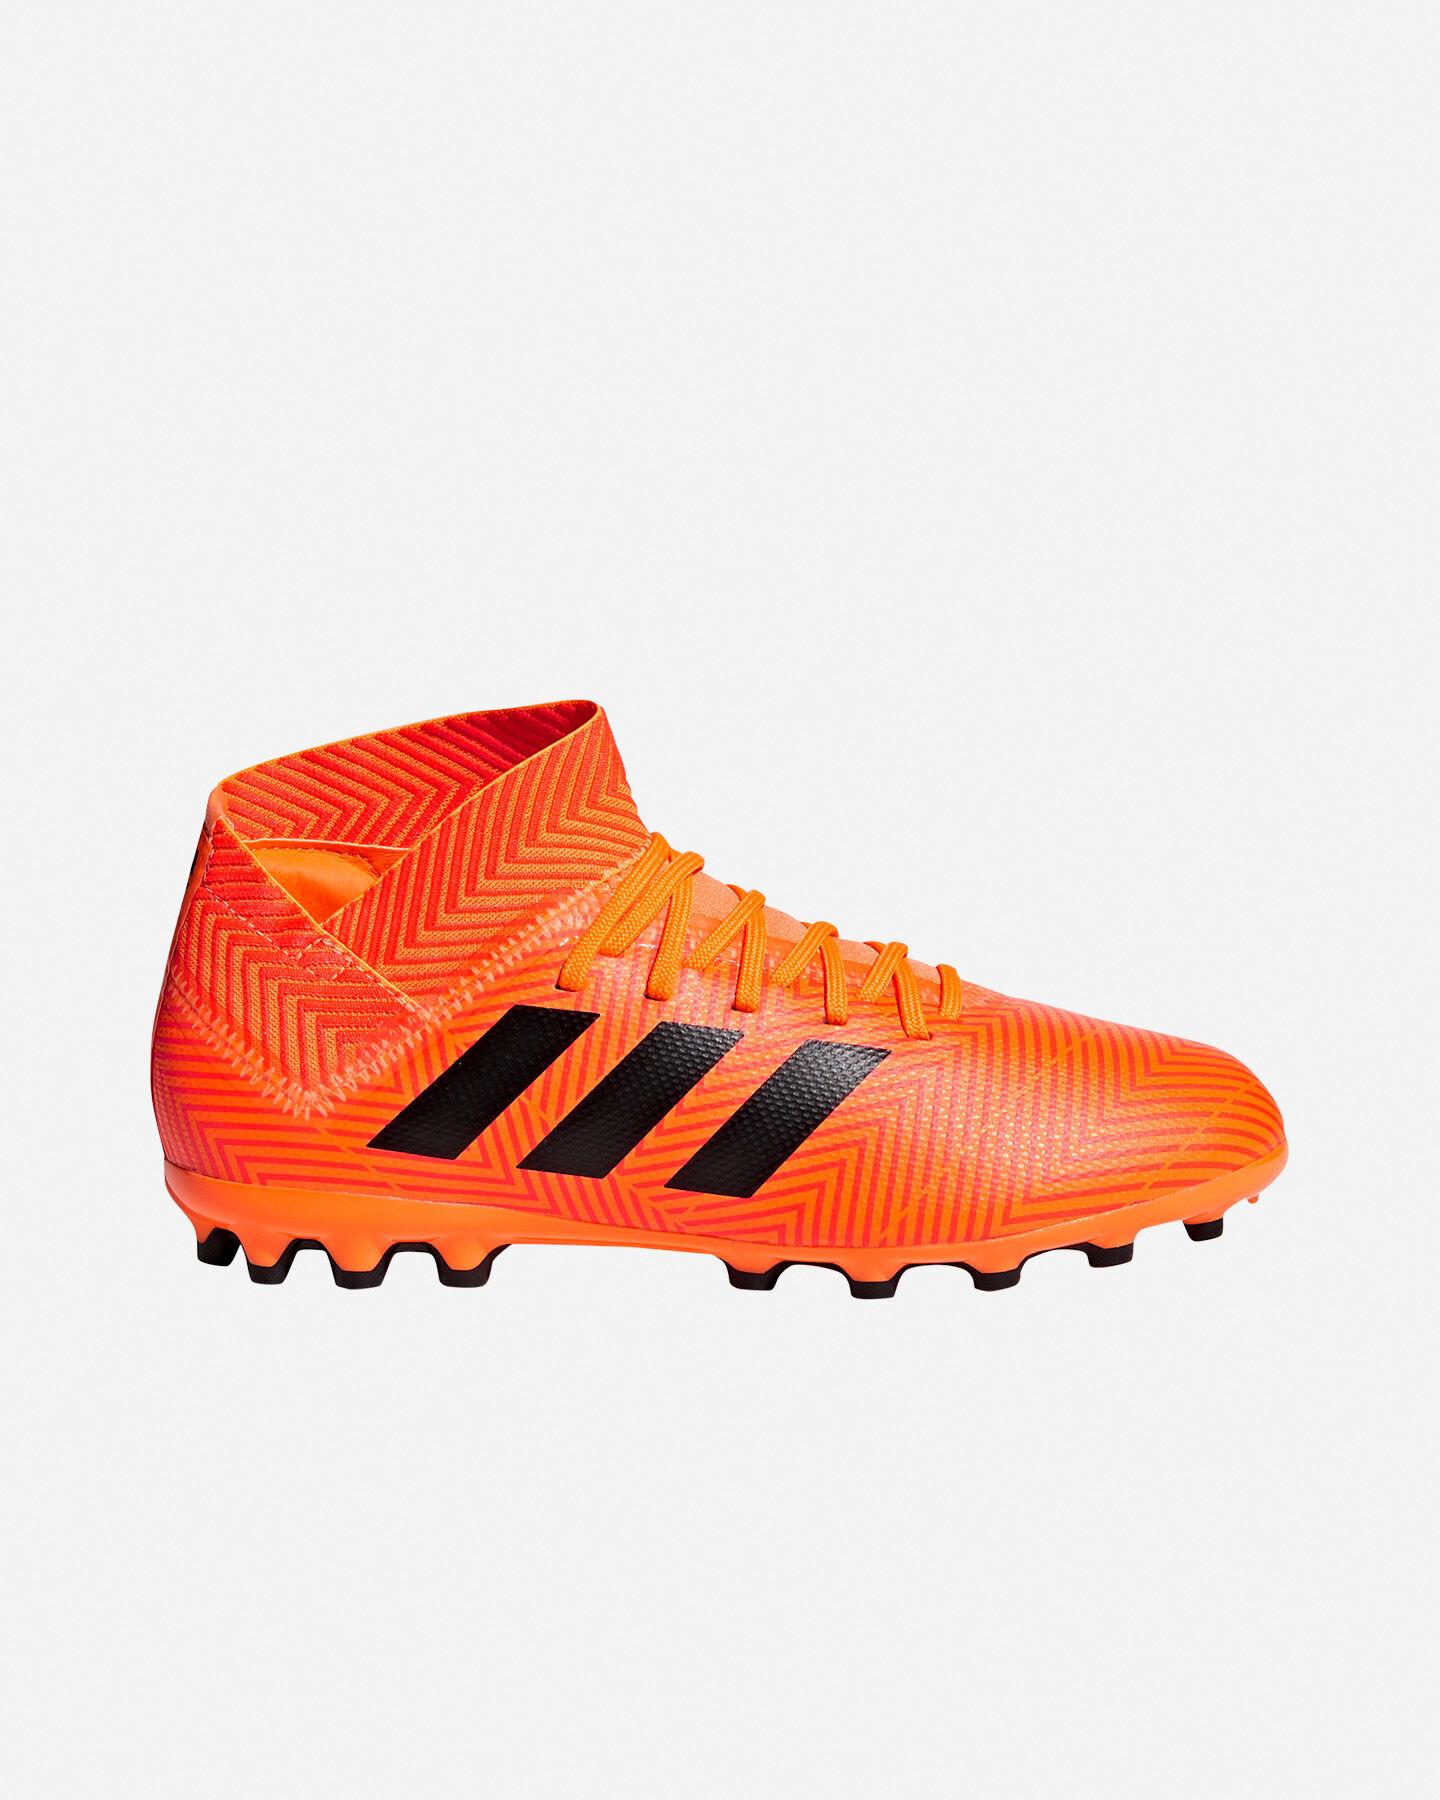 Su Cisalfa Apwa78qa Ag 18 Adidas Nemeziz D97872 3 Jr Sport Calcio Scarpe ggqxR5Zwrn